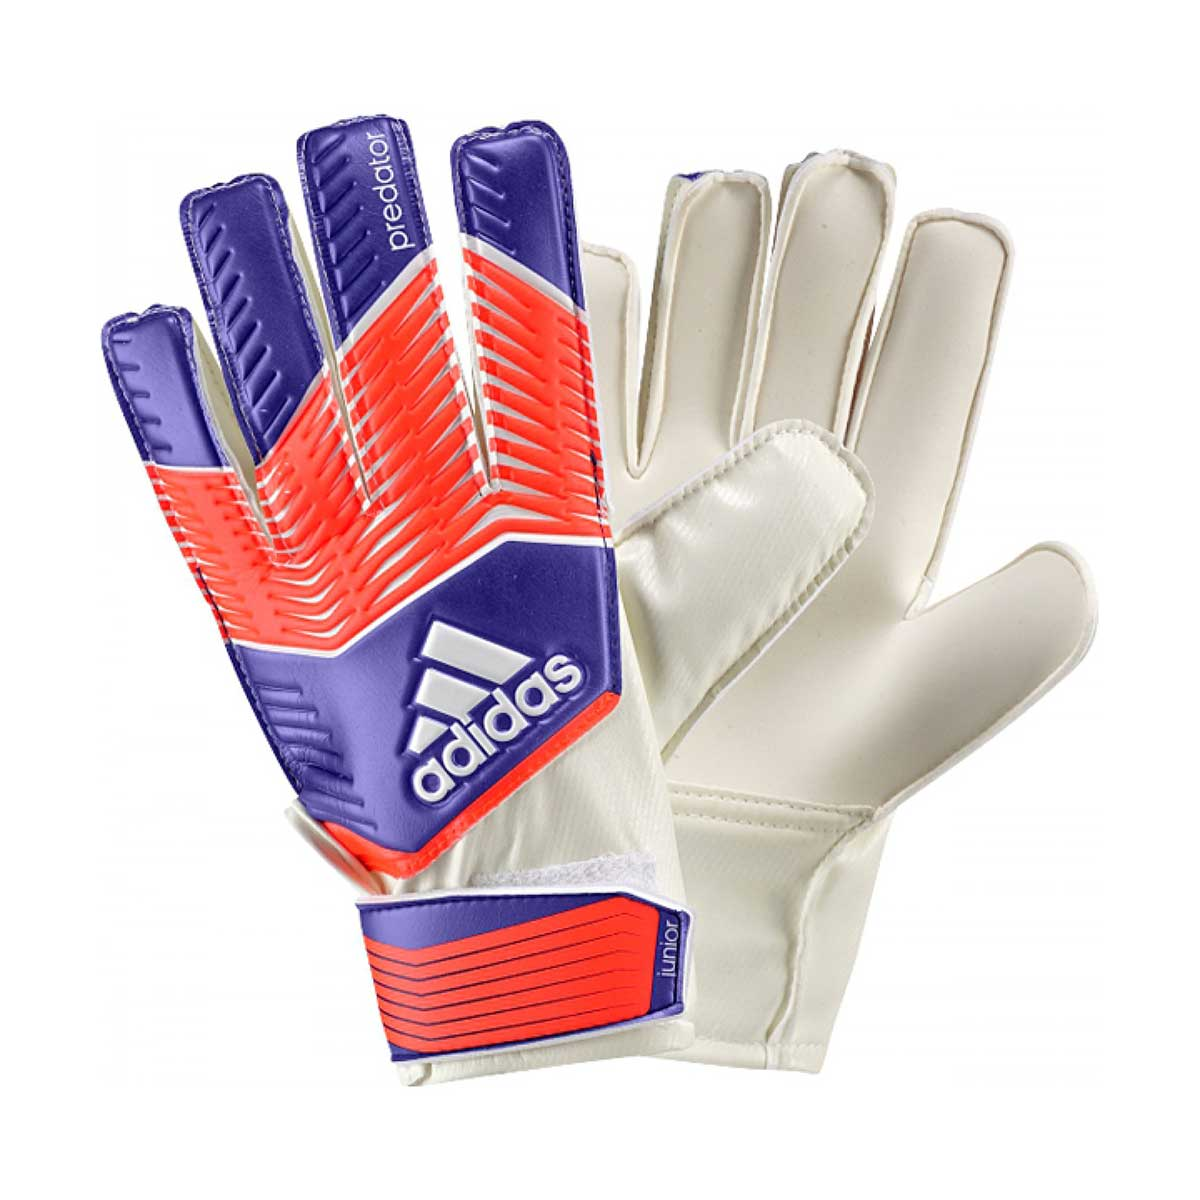 a527c3c9f3b6 Buy Adidas Predator Junior Training Goalkeeper Gloves Online India ...